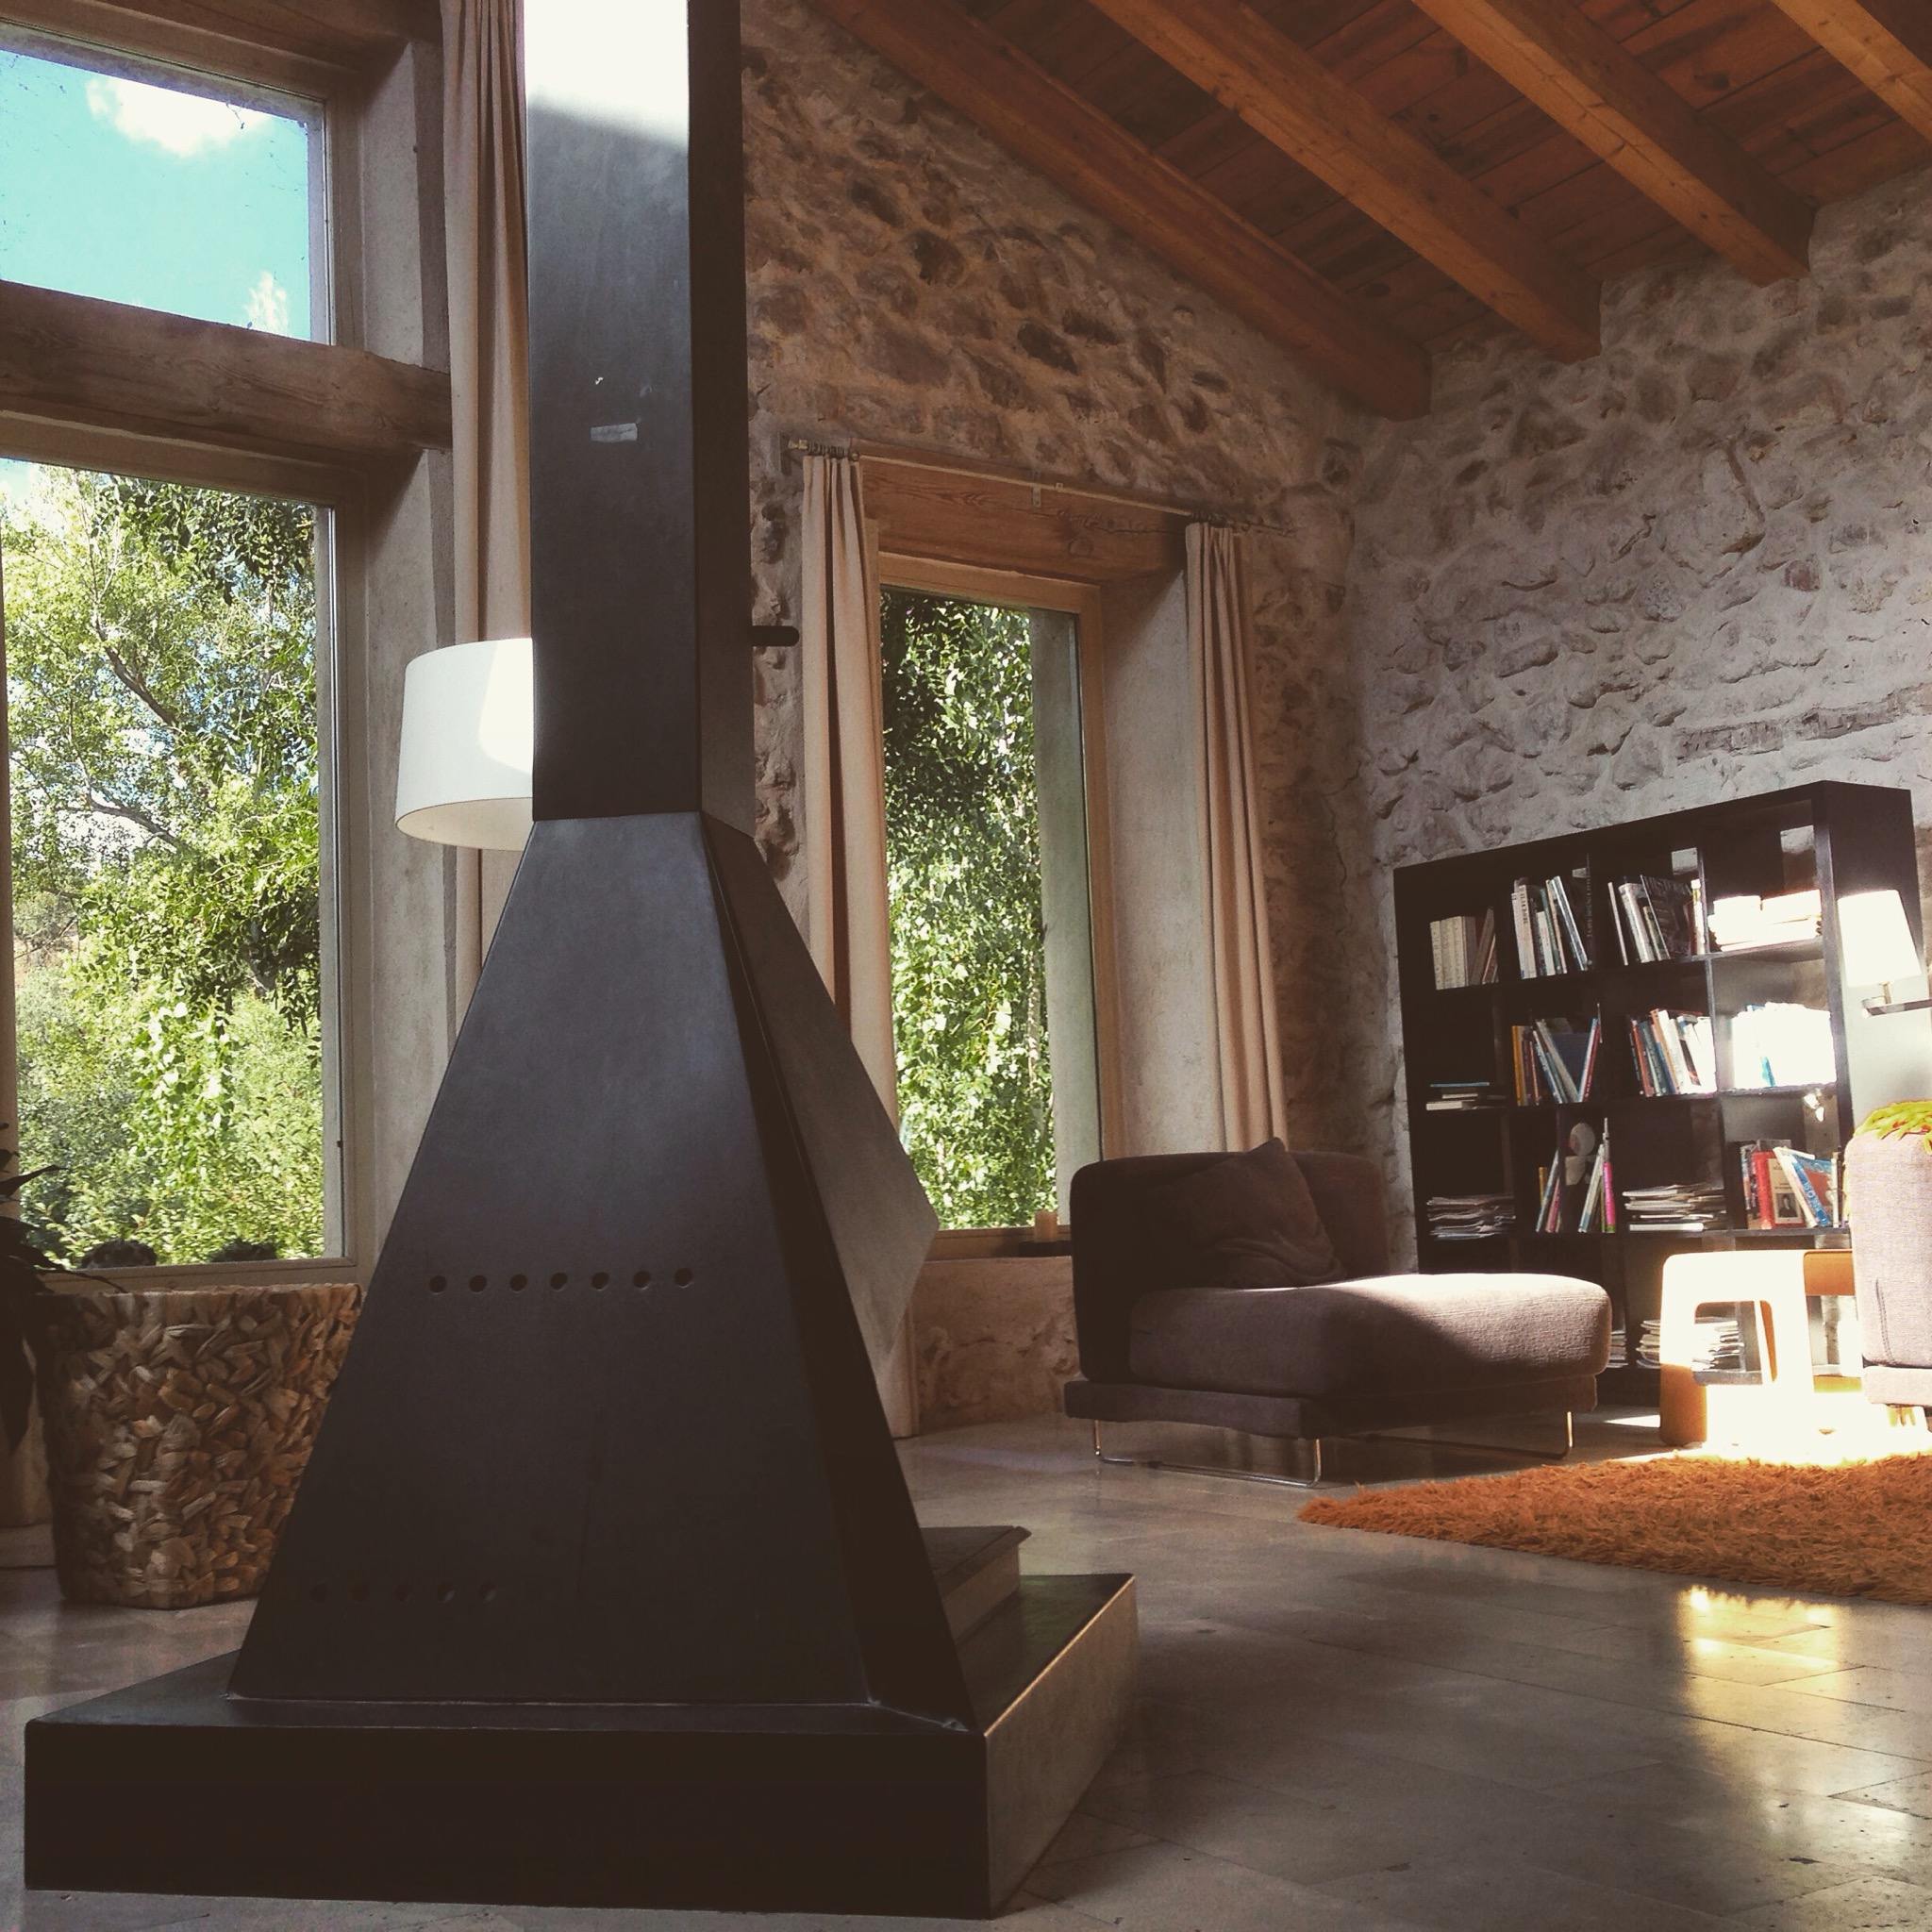 Casa De Diseño A 23 Km De Segovia Cottages For Rent In Peñarrubias De Pirón Castile And León Spain